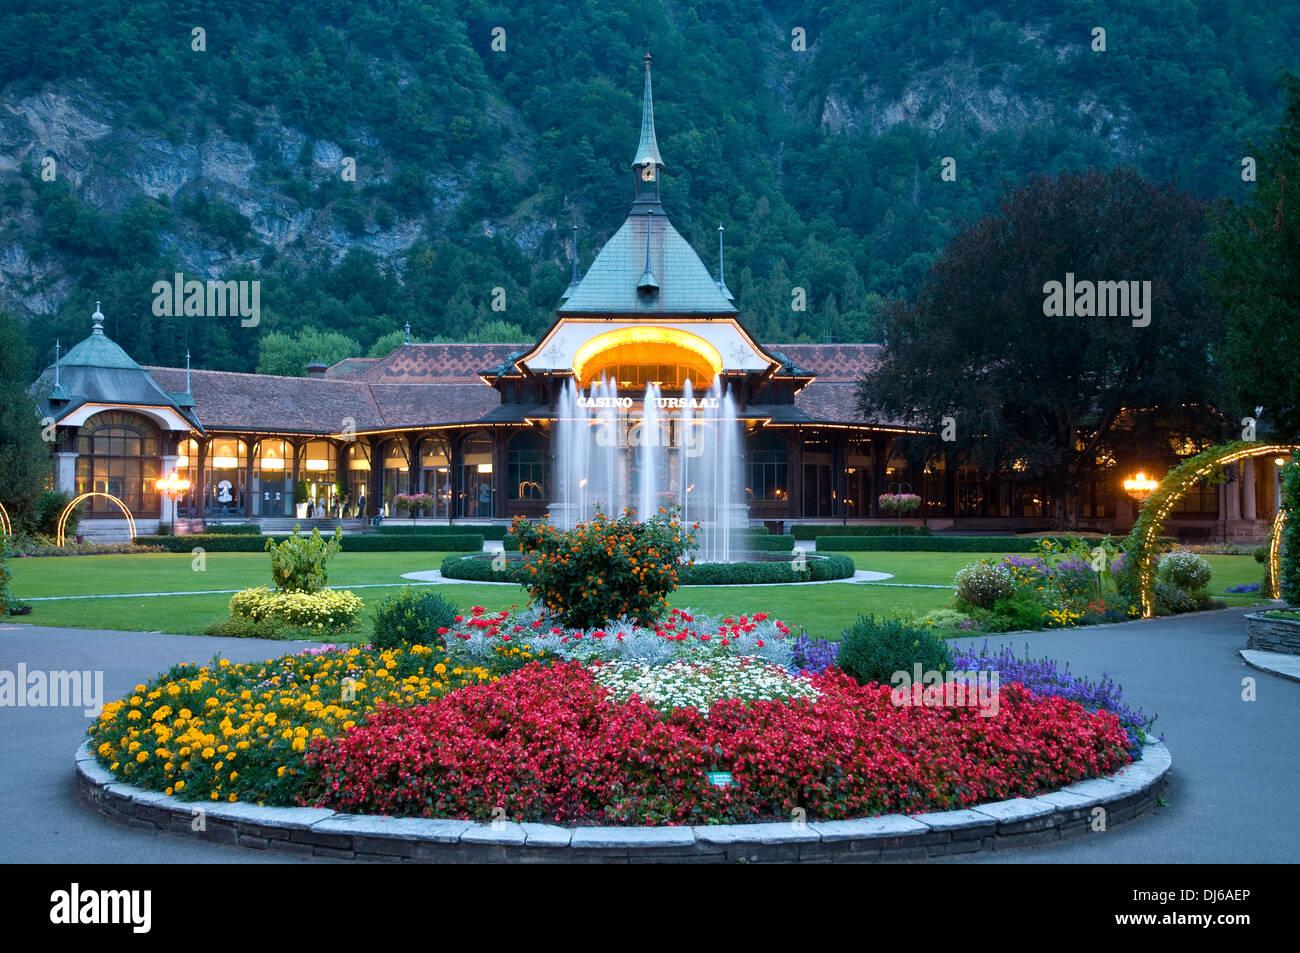 Casino interlaken online gambling sites that accept paypal